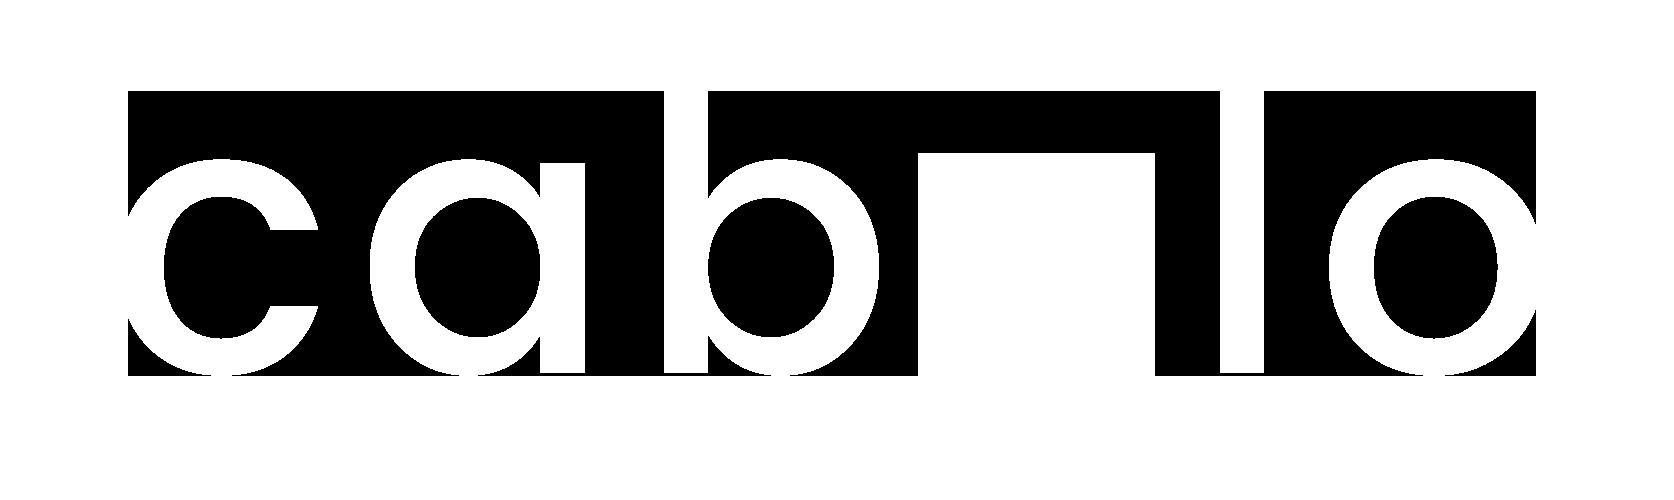 Cabolo - Web Agency Bologna, Bari